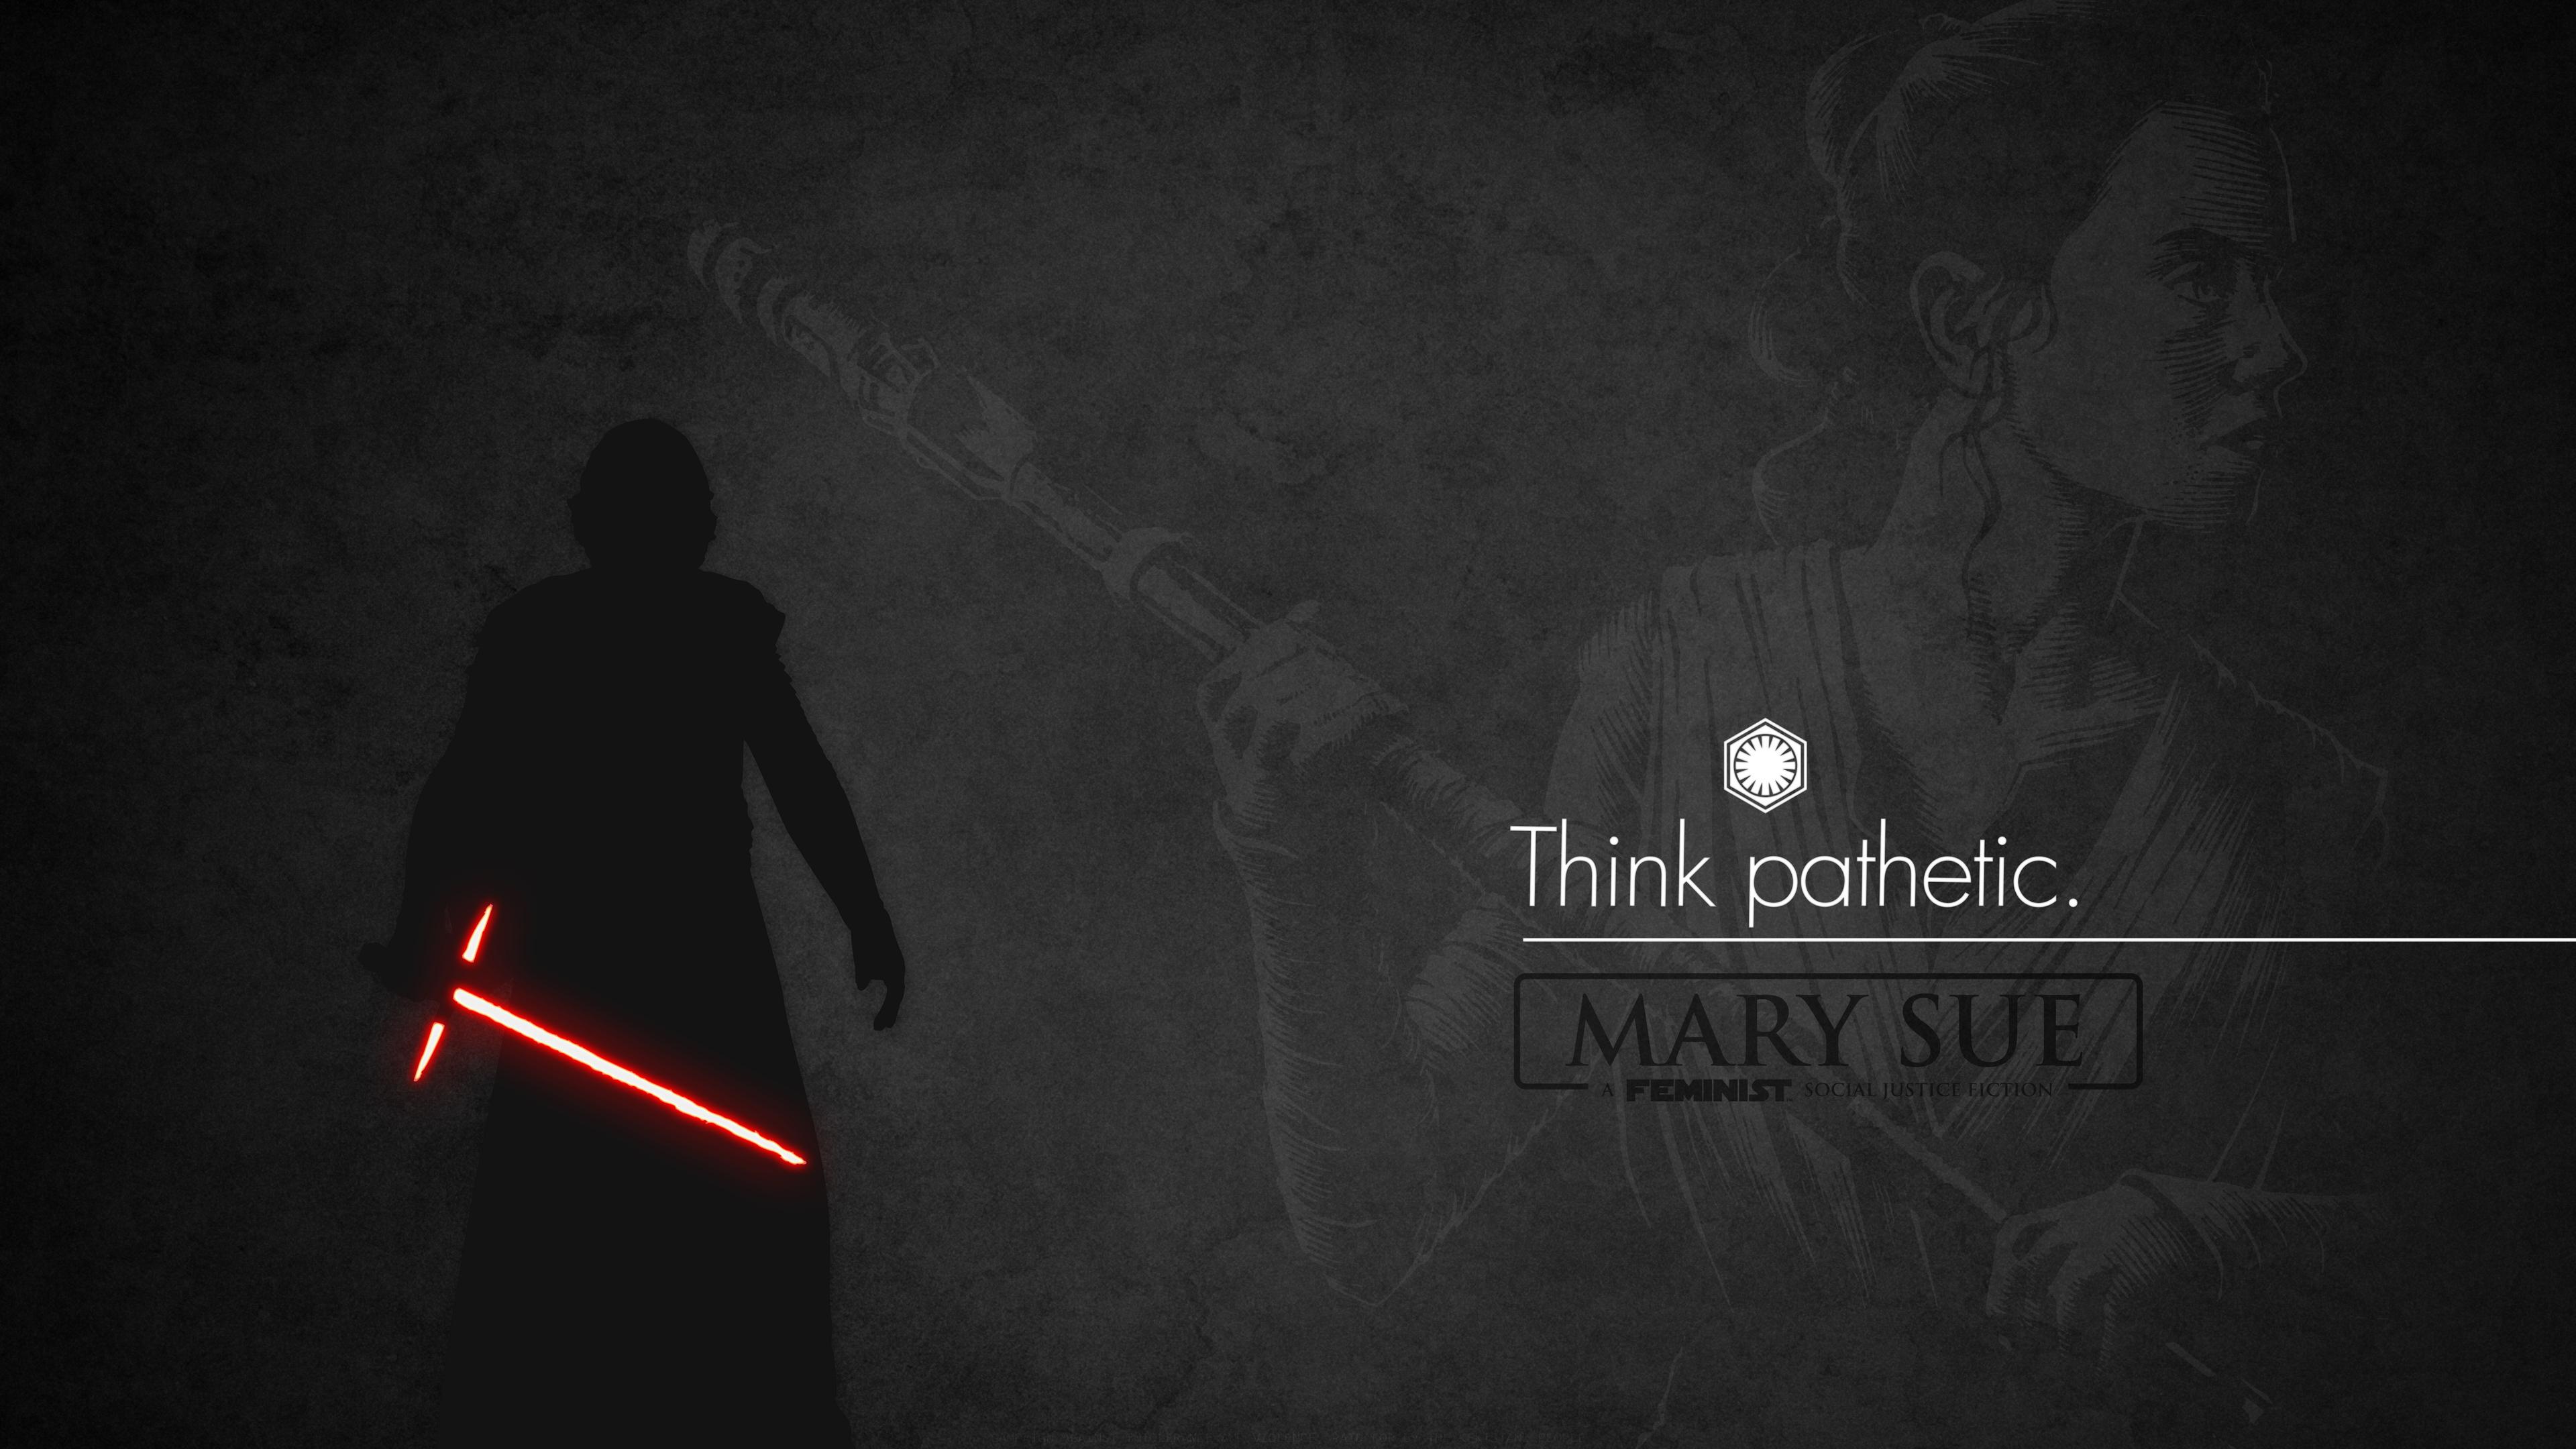 4k Wallpaper Ben Solo The Last Jedi Think Pathetic By Petraveoleno On Deviantart